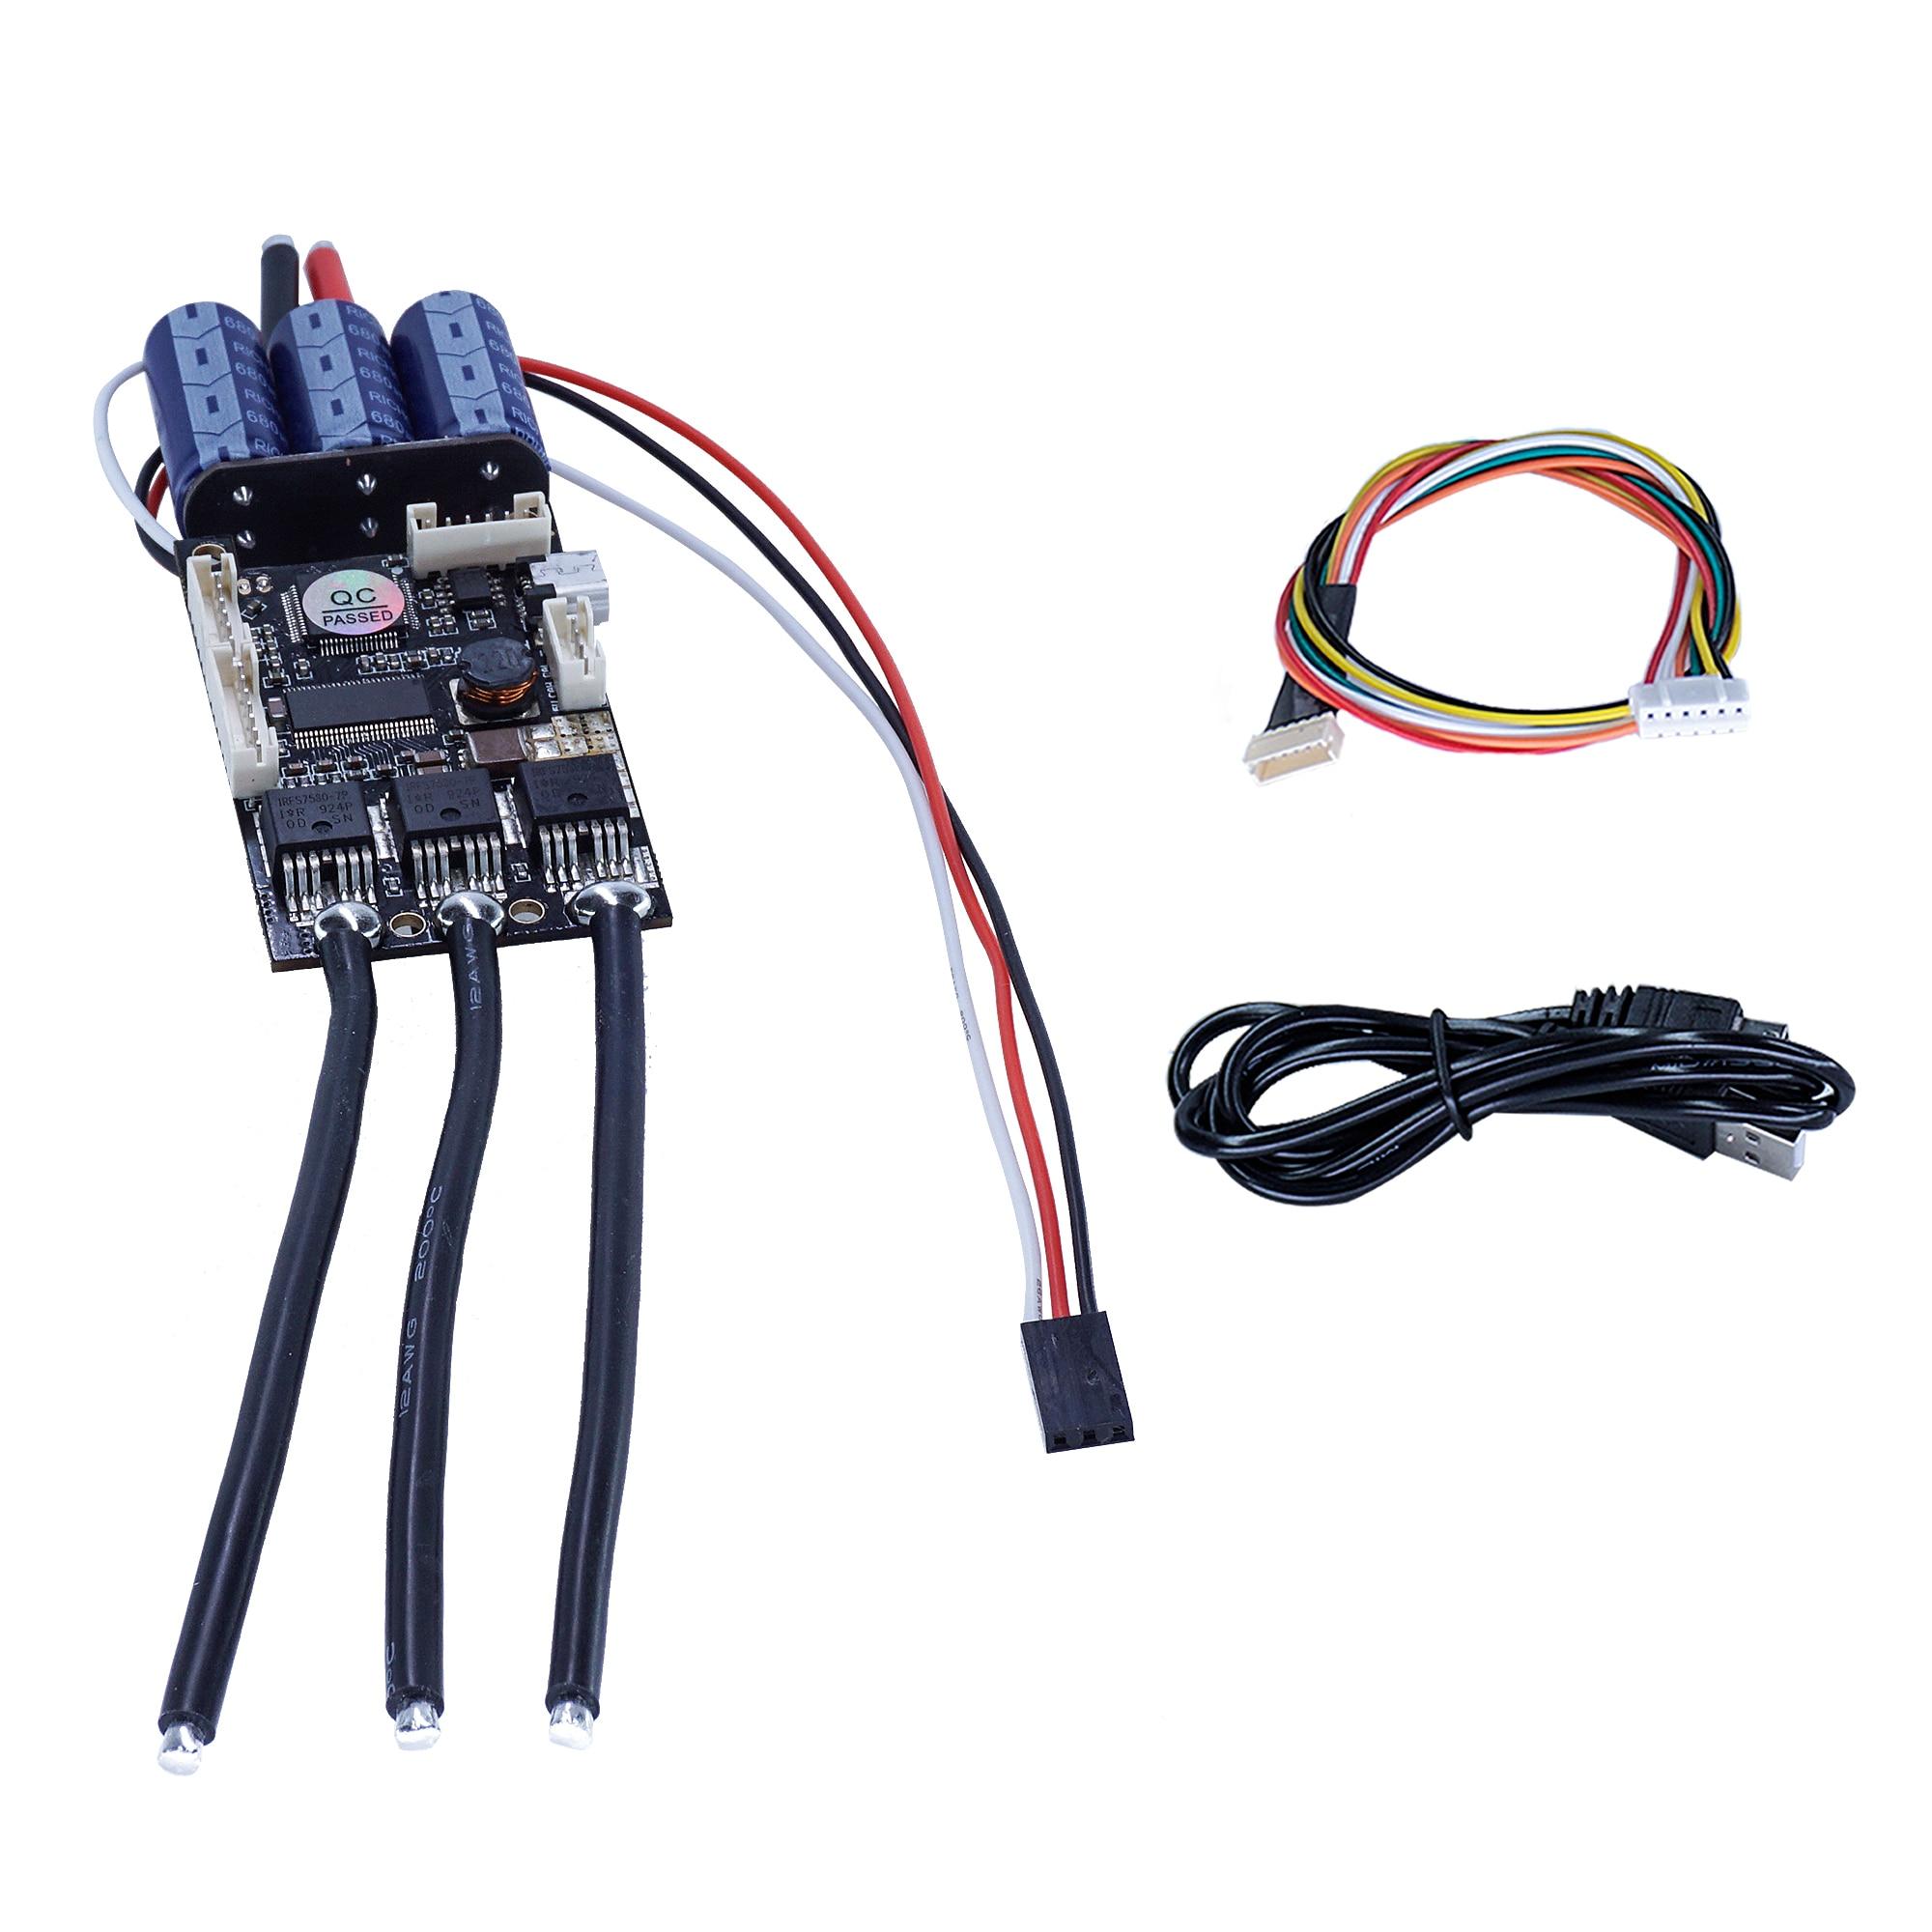 Skateboard Speed Controller FSESC 4.12 50A Based on VESC® 4.12 Remote Control Accessories Outdoor ESC 48v Electric Longboard enlarge